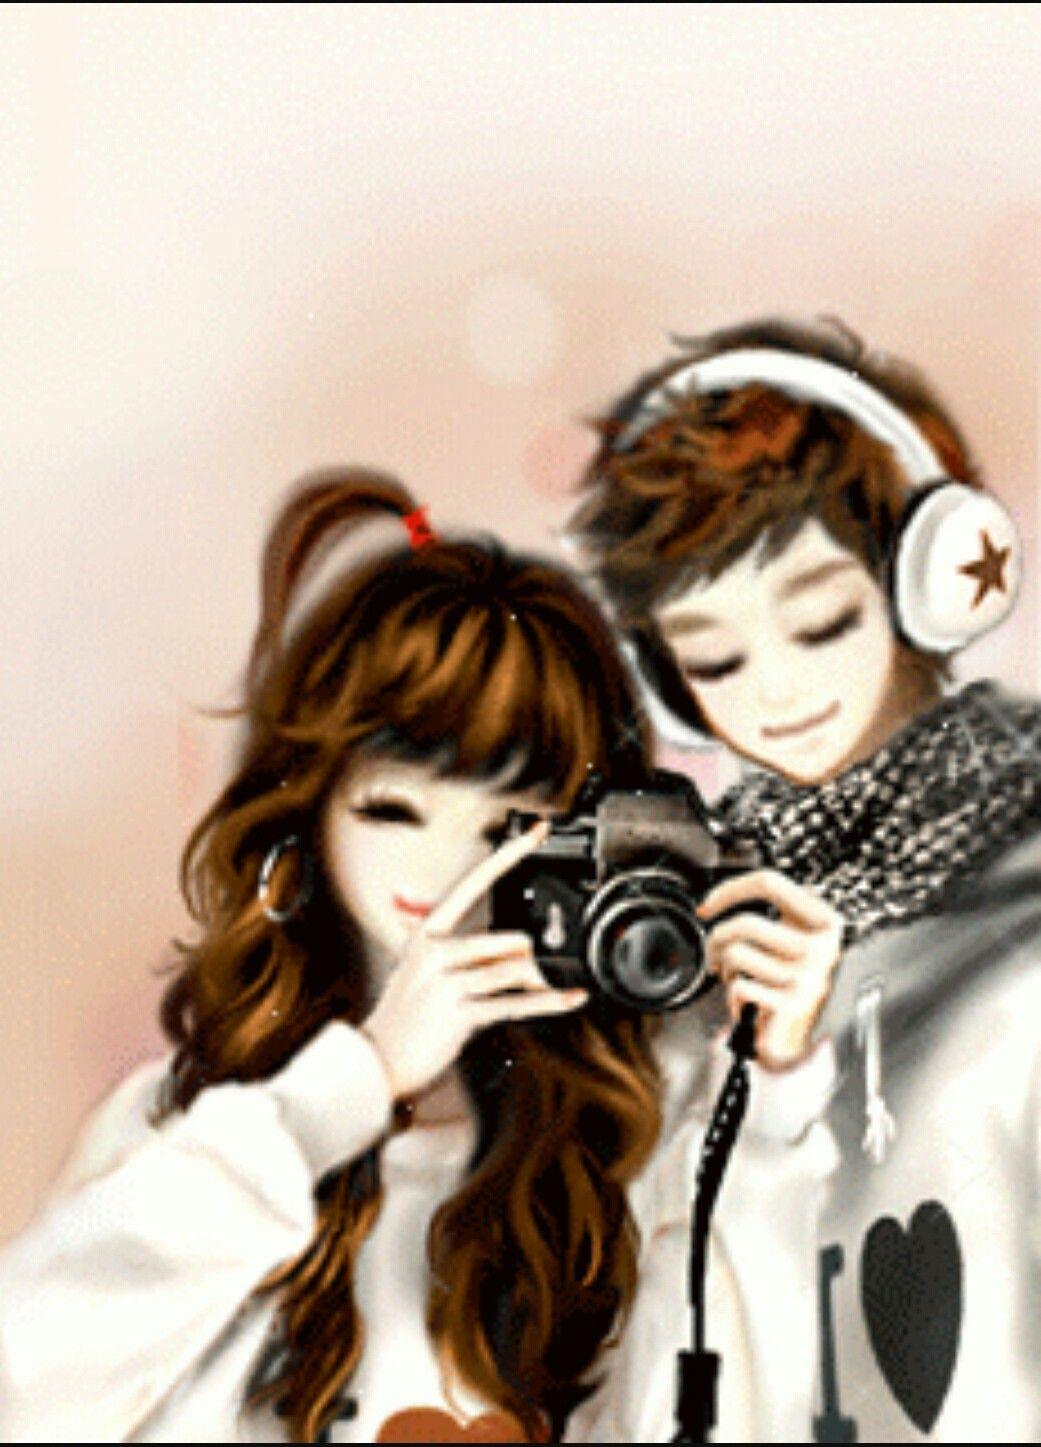 Pin By Mj Love On Munecas Bonitas Anime Korea Cute Couples